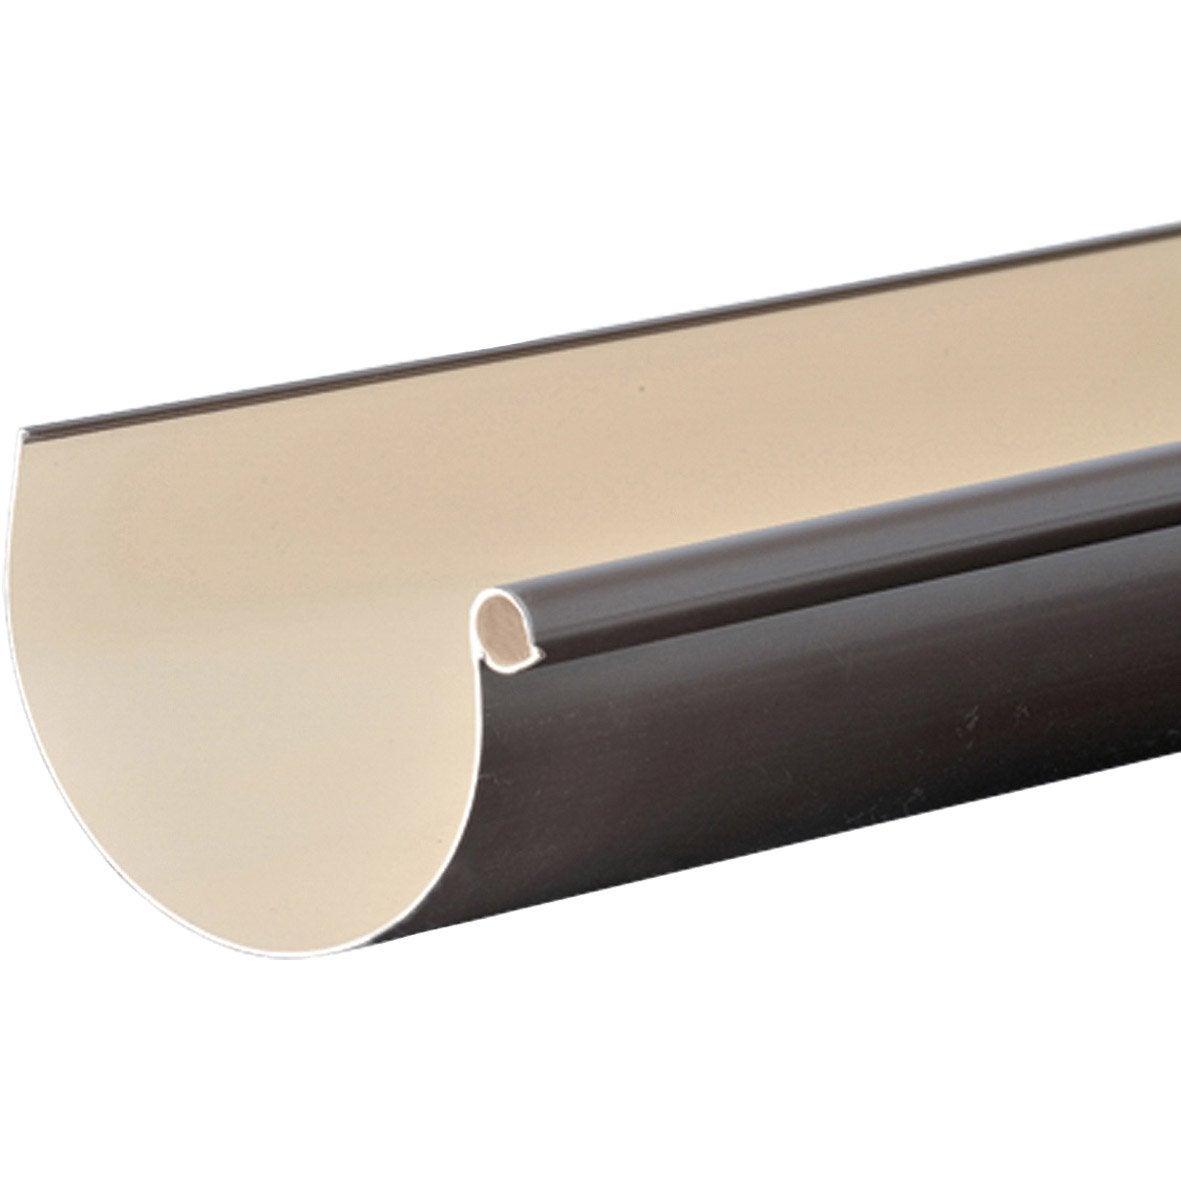 goutti re demi ronde pvc girpi d cm marron l 2 m leroy merlin. Black Bedroom Furniture Sets. Home Design Ideas